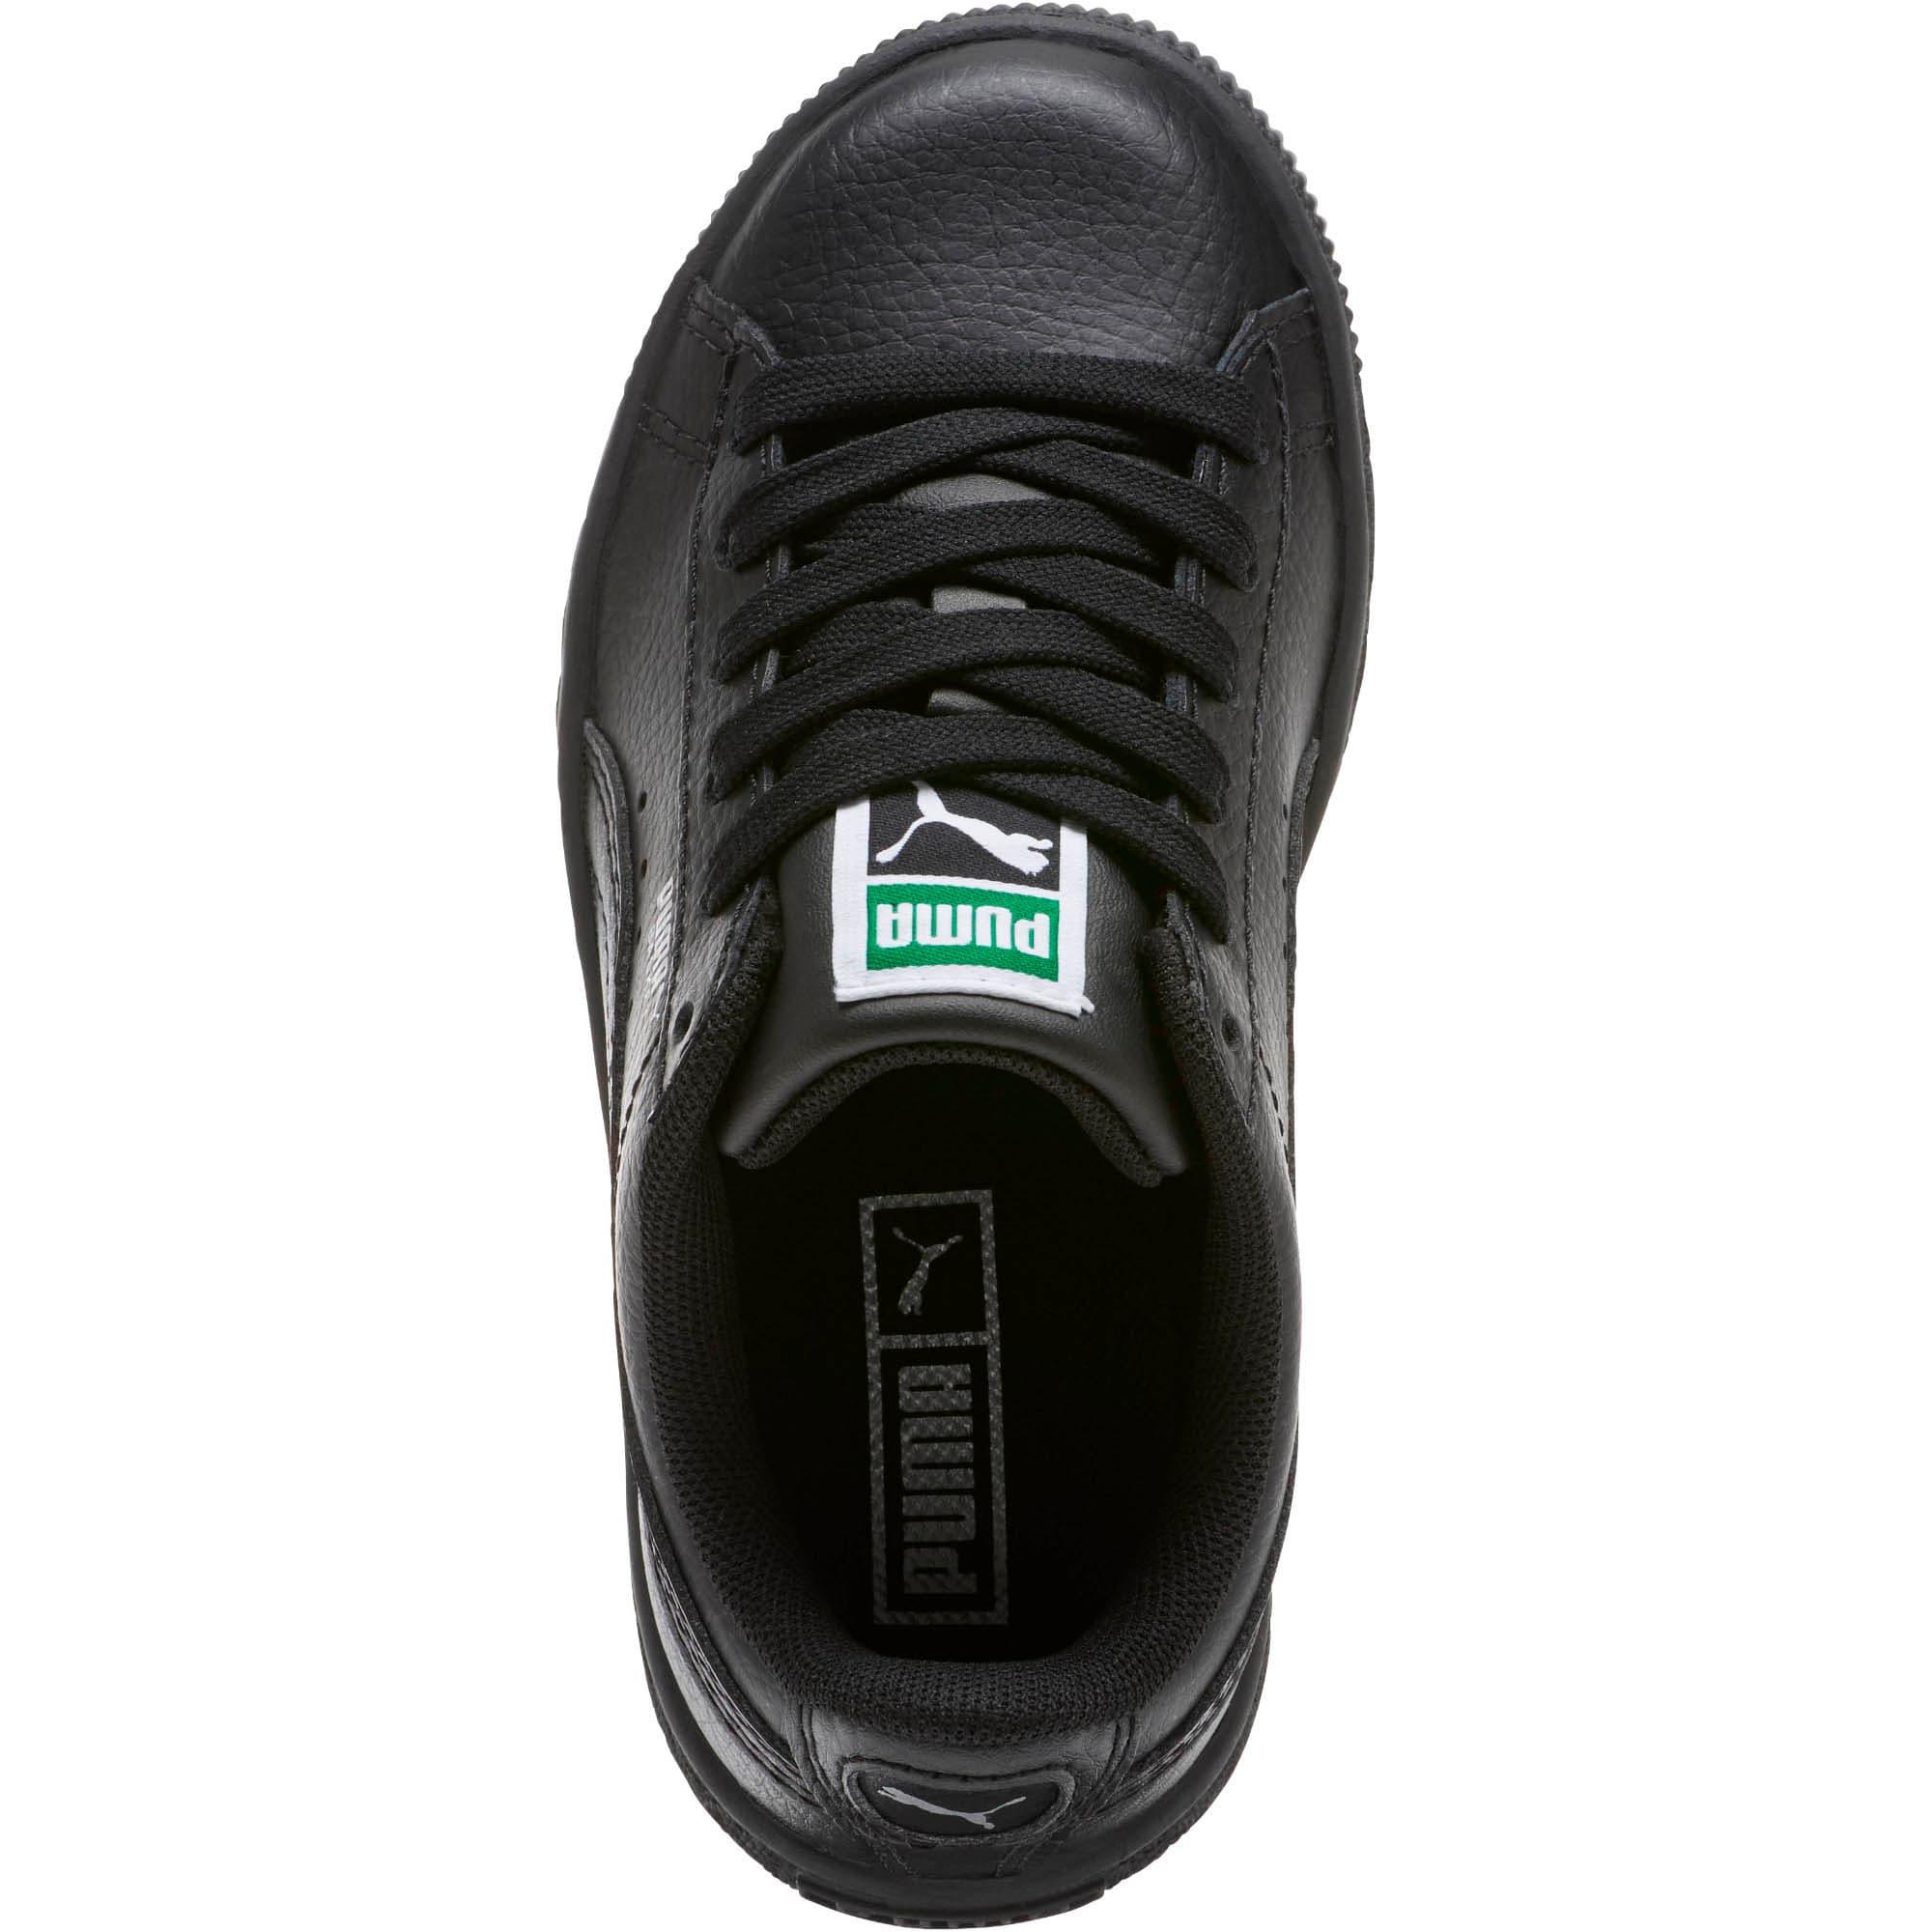 Thumbnail 5 of Basket Classic Little Kids' Shoes, Puma Black-Puma Black, medium